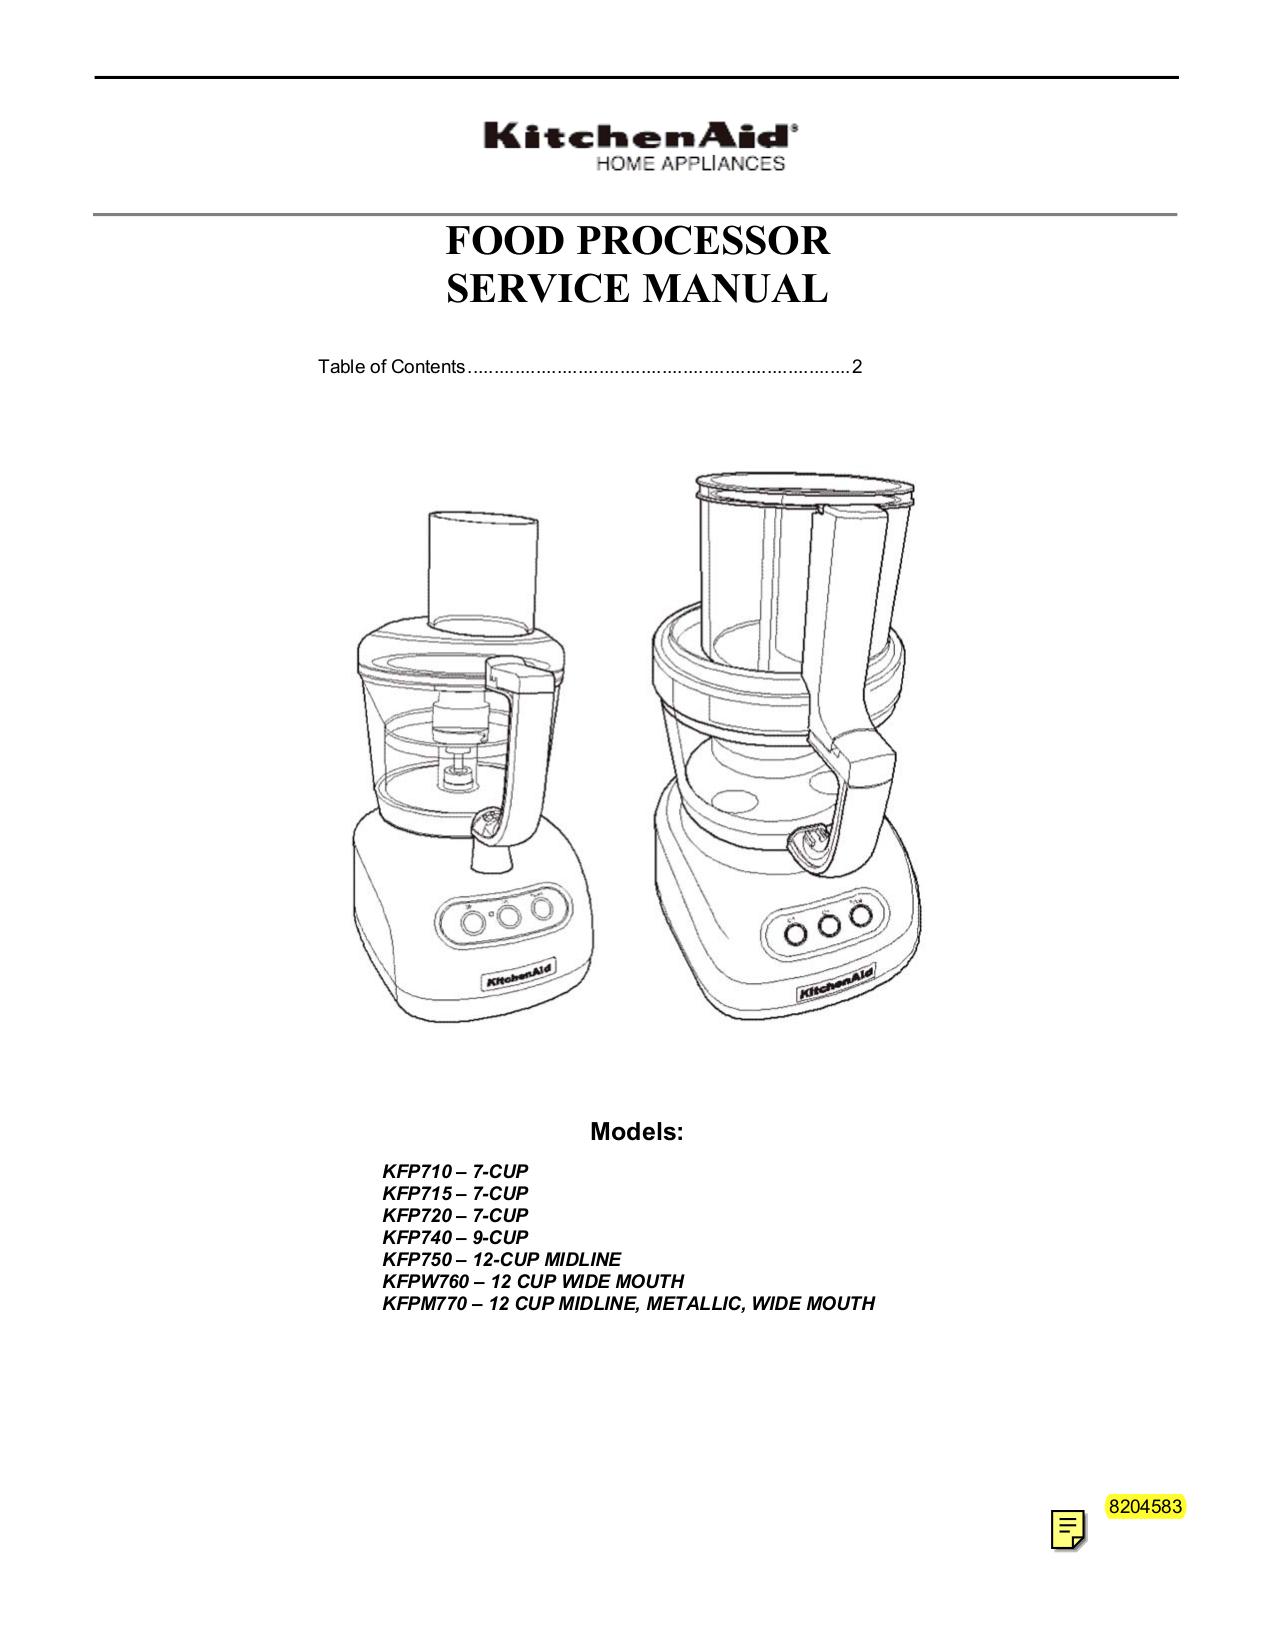 download free pdf for kitchenaid kfp750 food processor manual rh umlib com KitchenAid Food Processor Models Mini Food Processor Bed Bath and Beyond